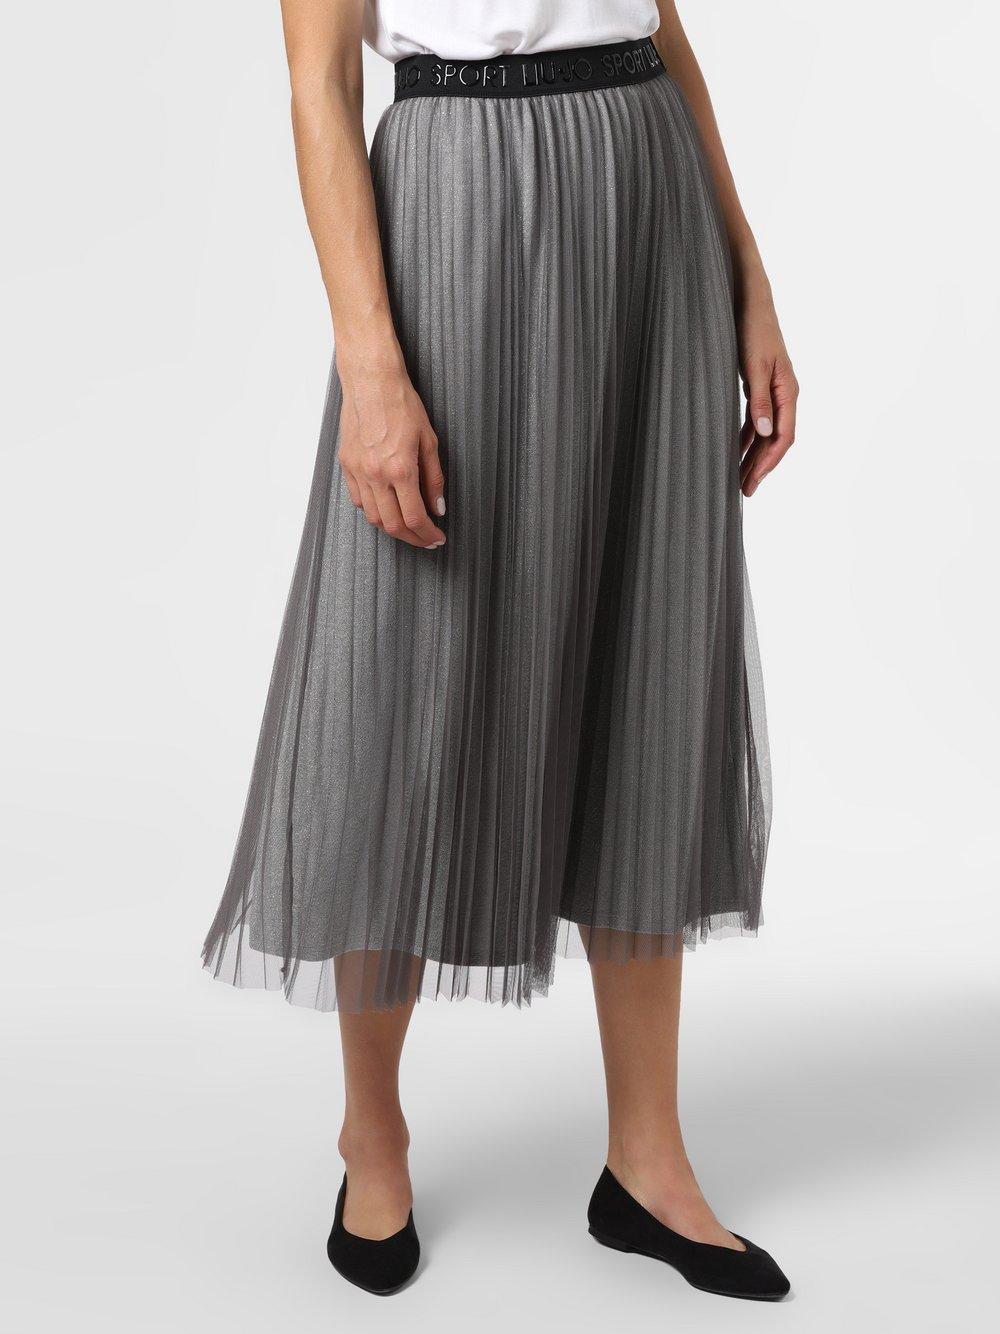 Liu Jo Collection - Spódnica damska, szary